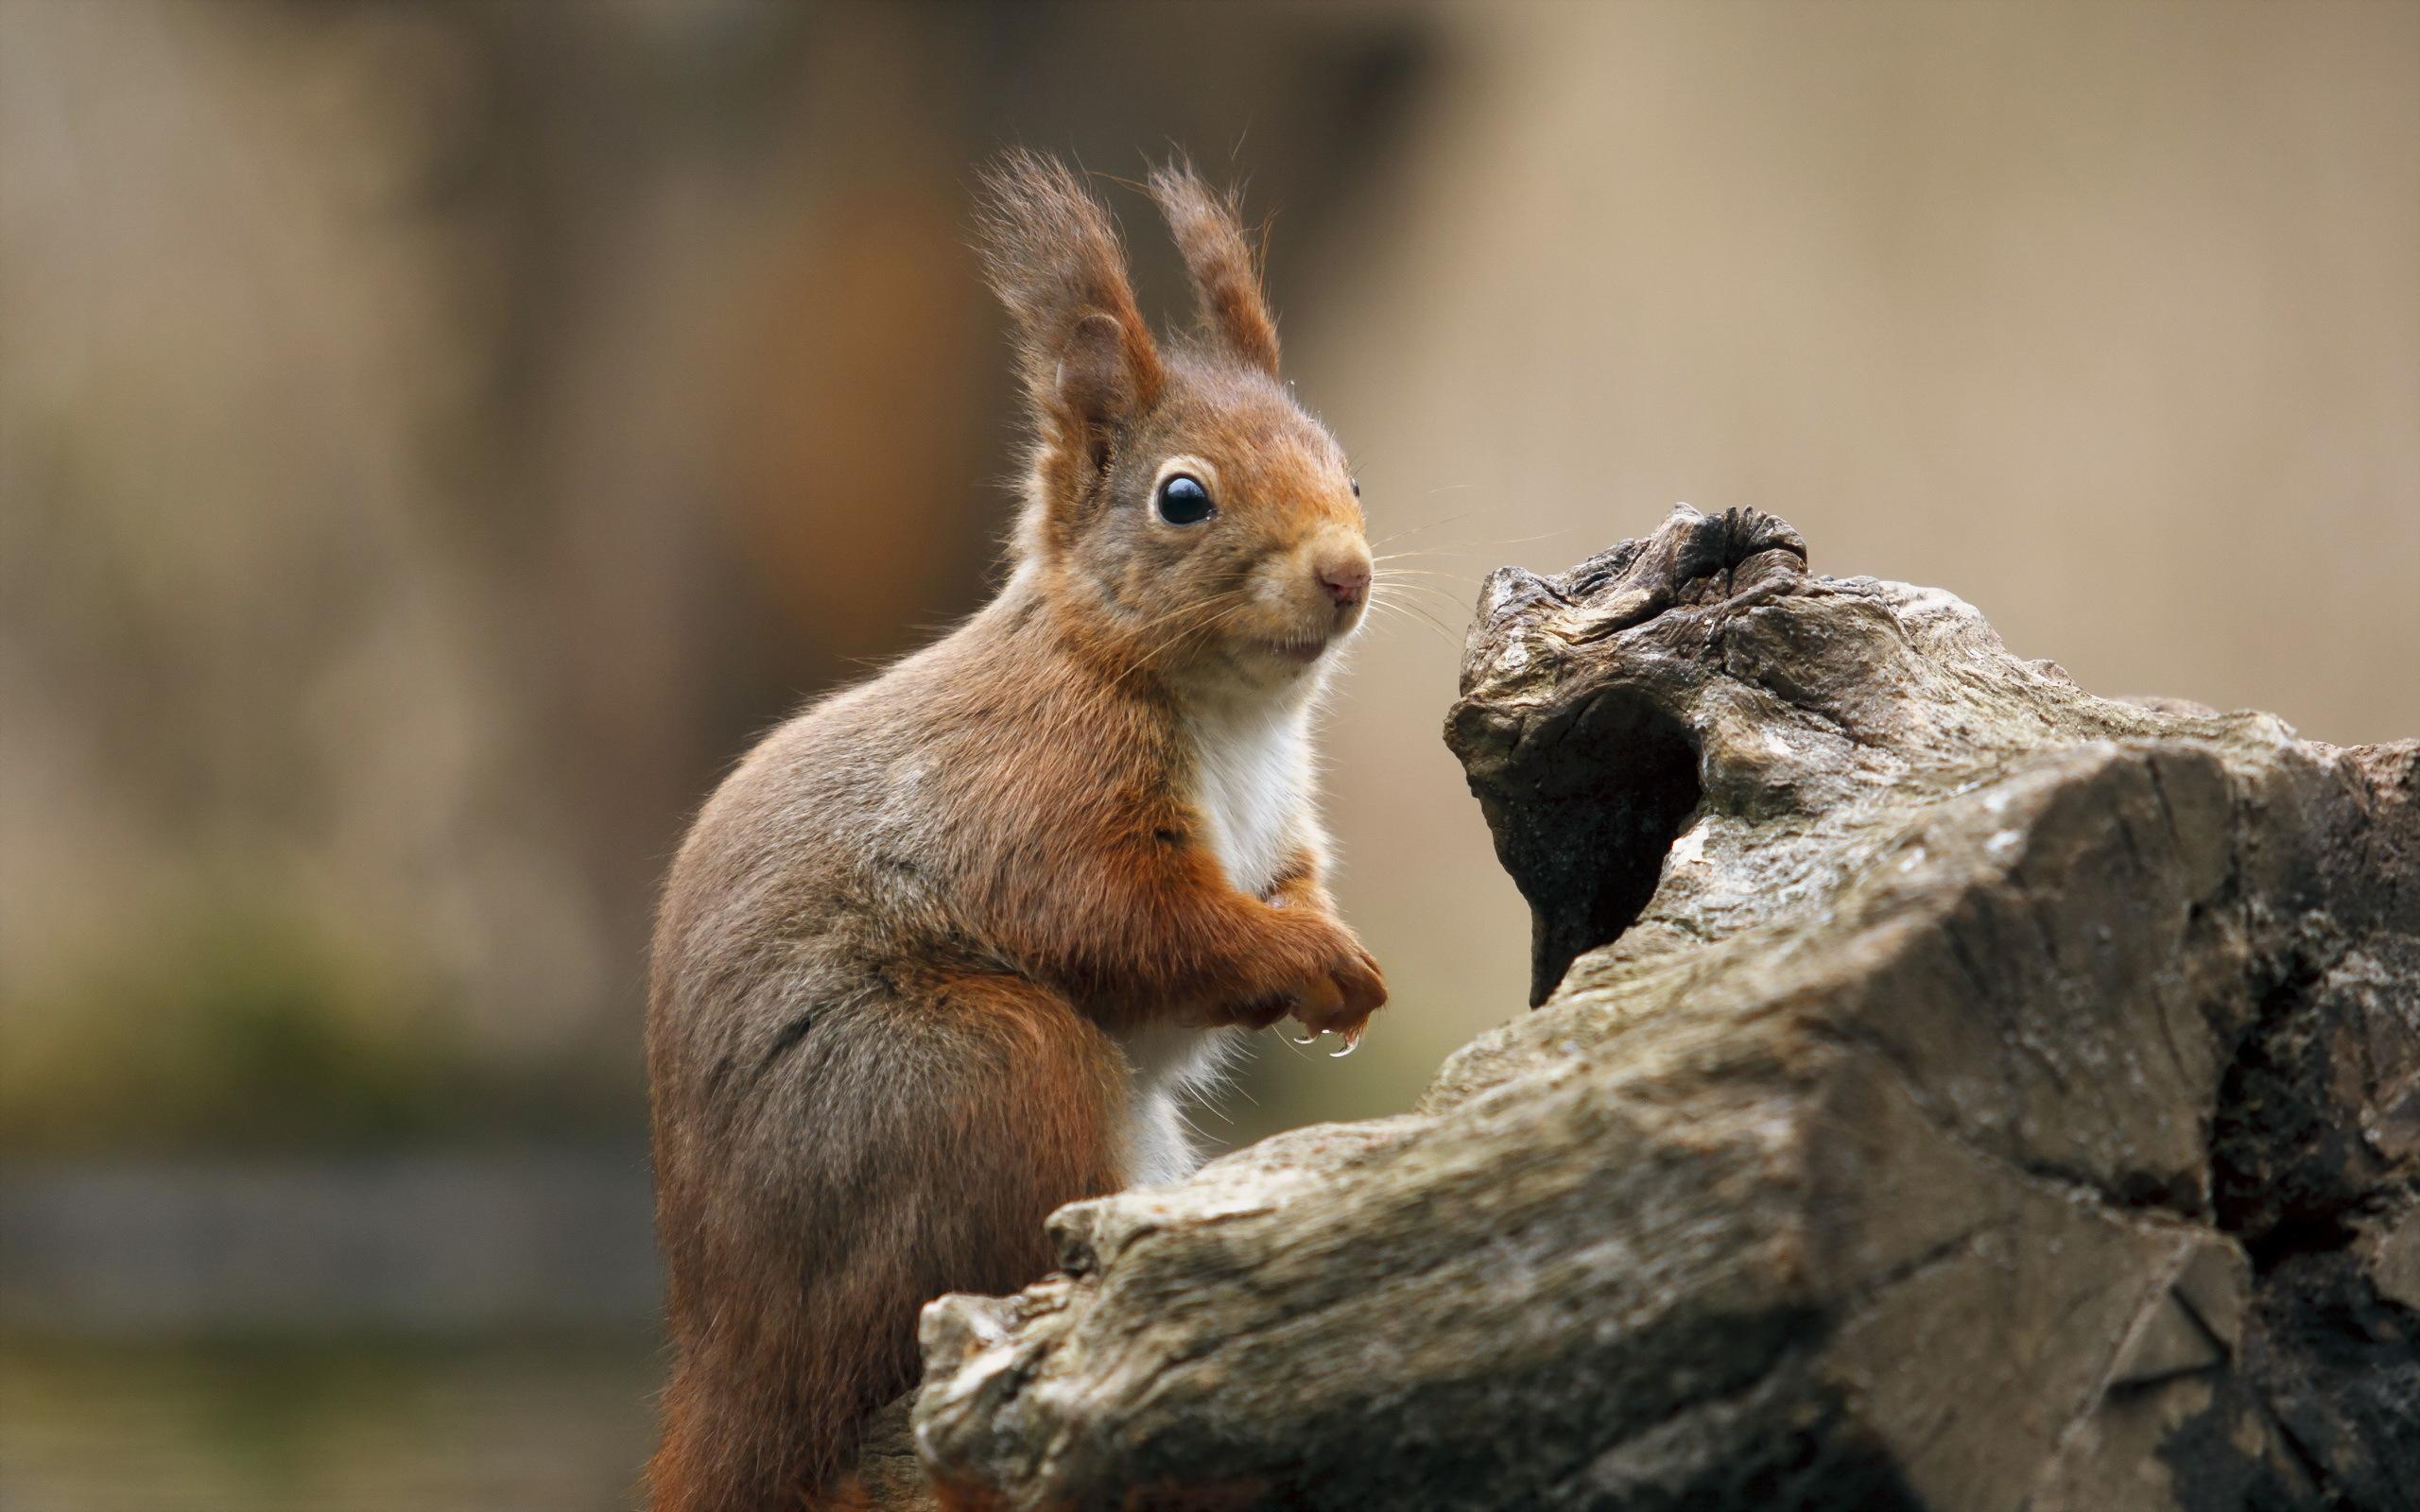 Squirrel Widescreen